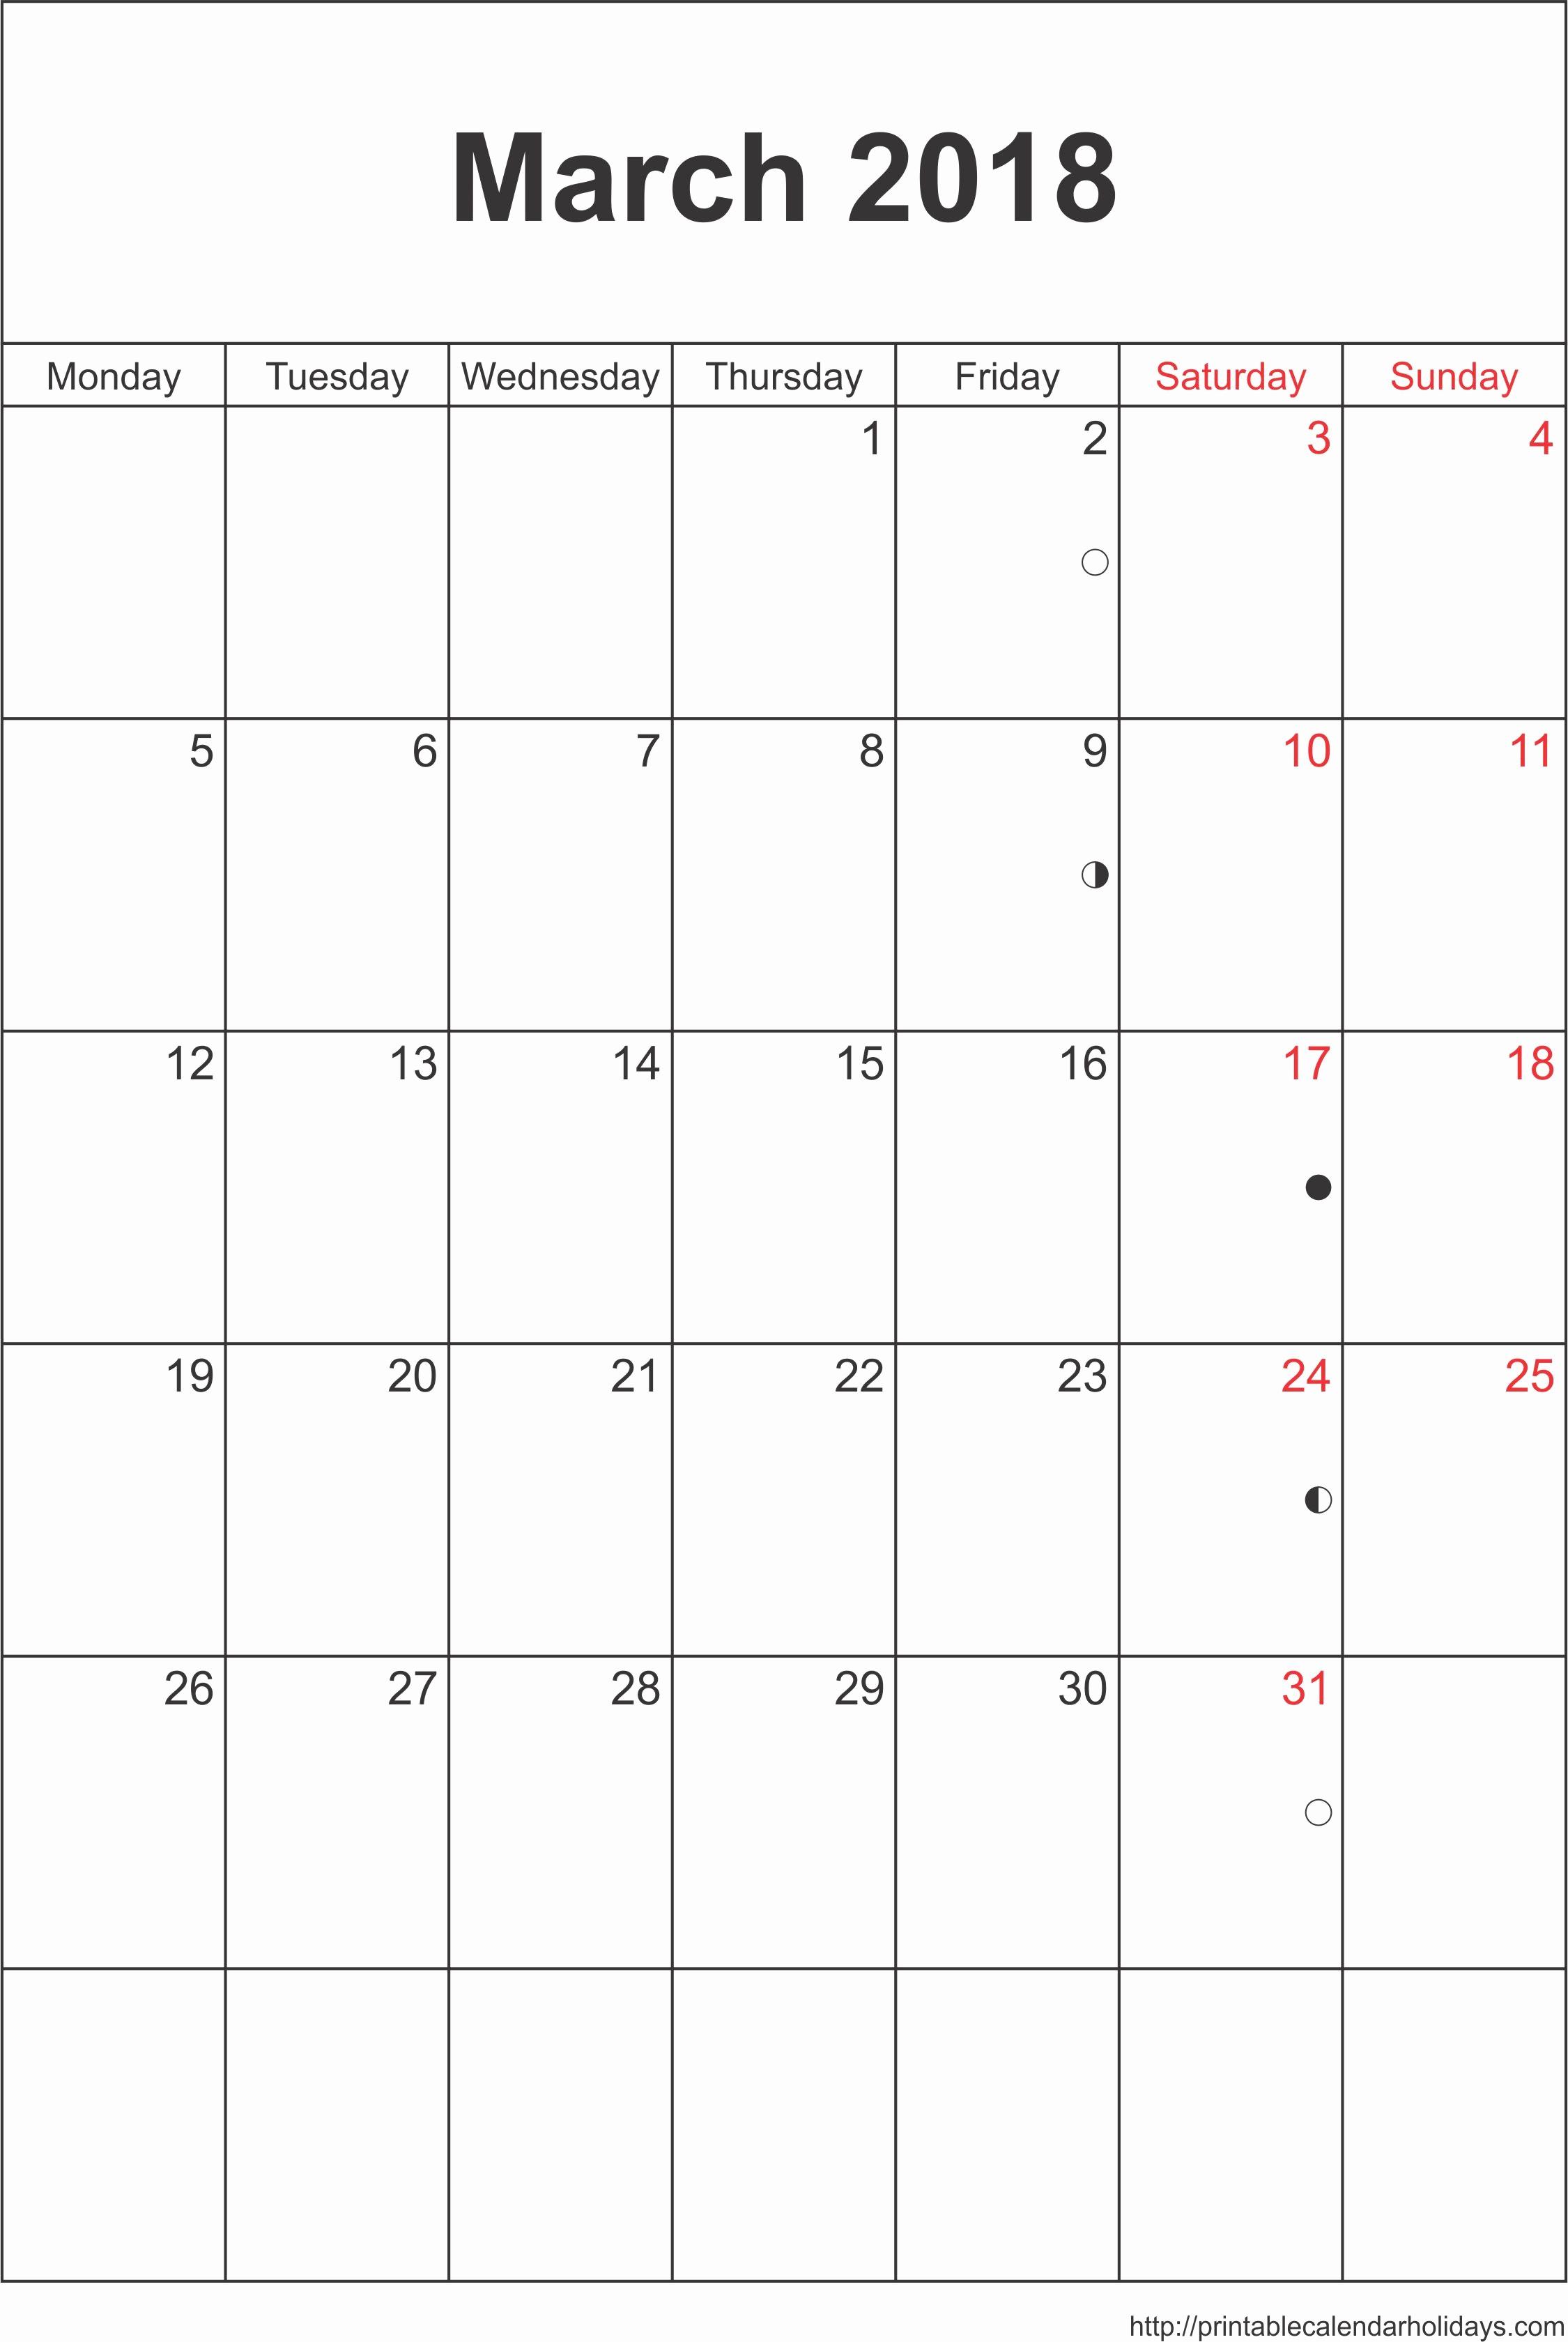 Microsoft Word 2018 Calendar Templates Lovely March 2018 Calendar Word